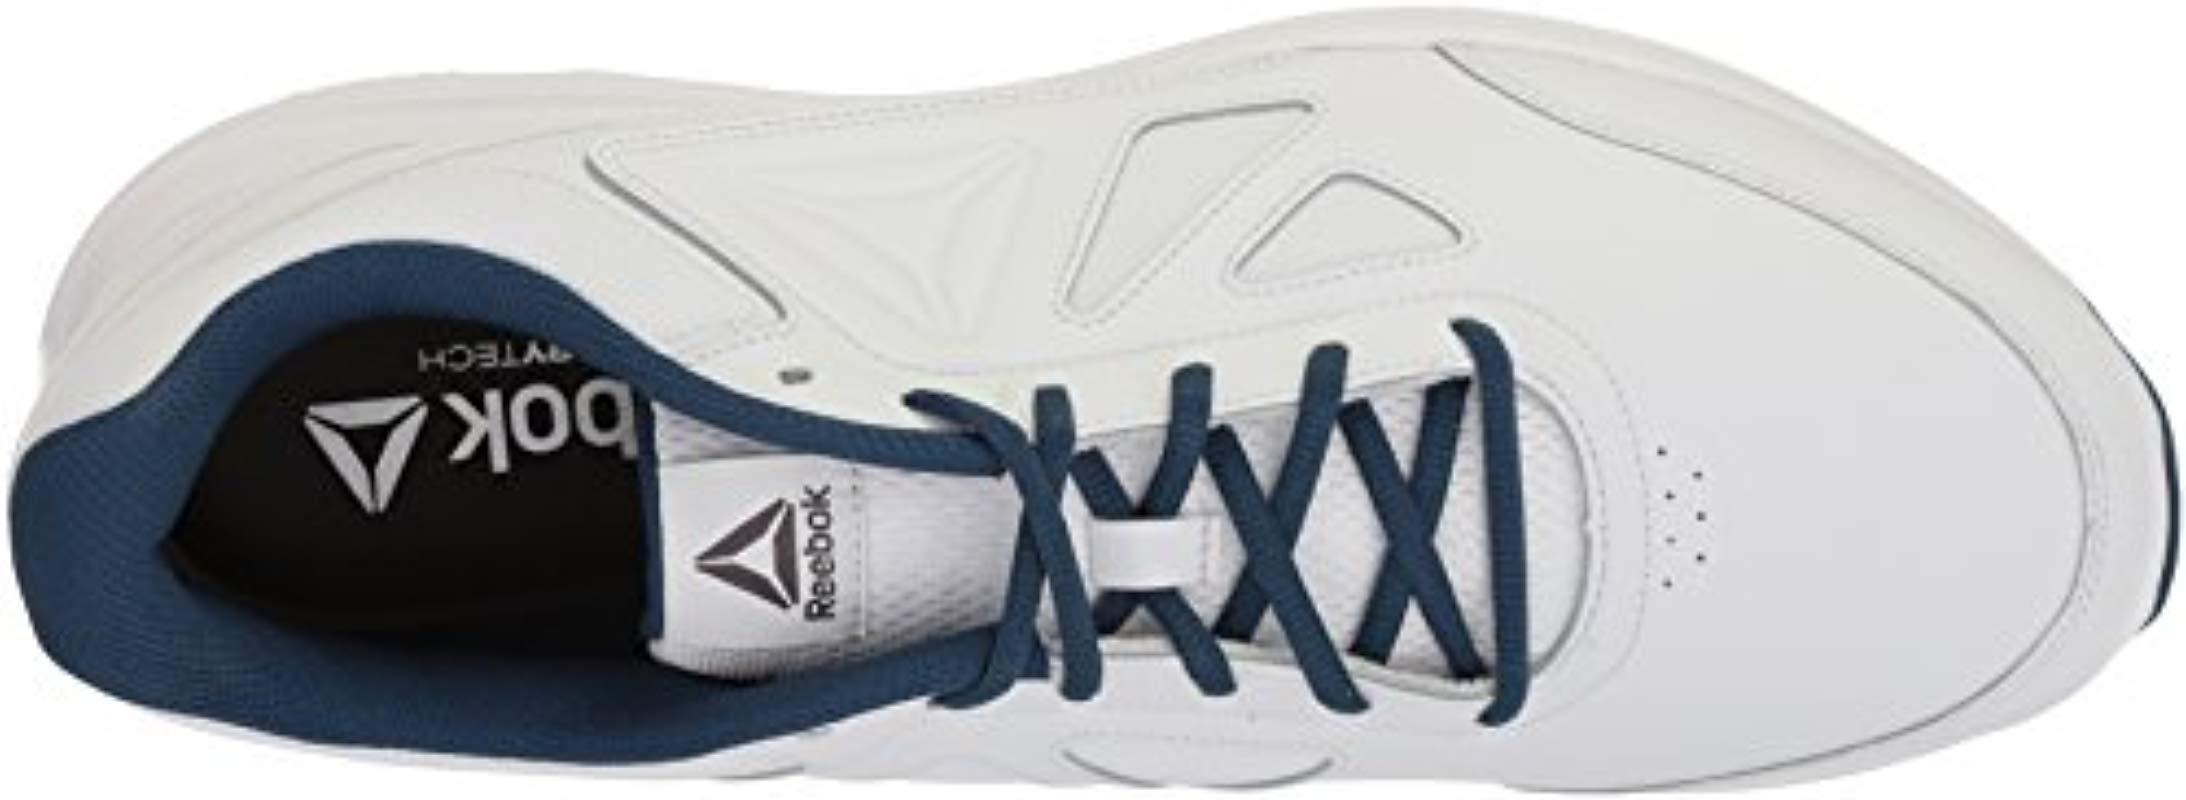 6a1c2433094 Reebok - Blue Walk Ultra 6 Dmx Max 4e Sneaker for Men - Lyst. View  fullscreen